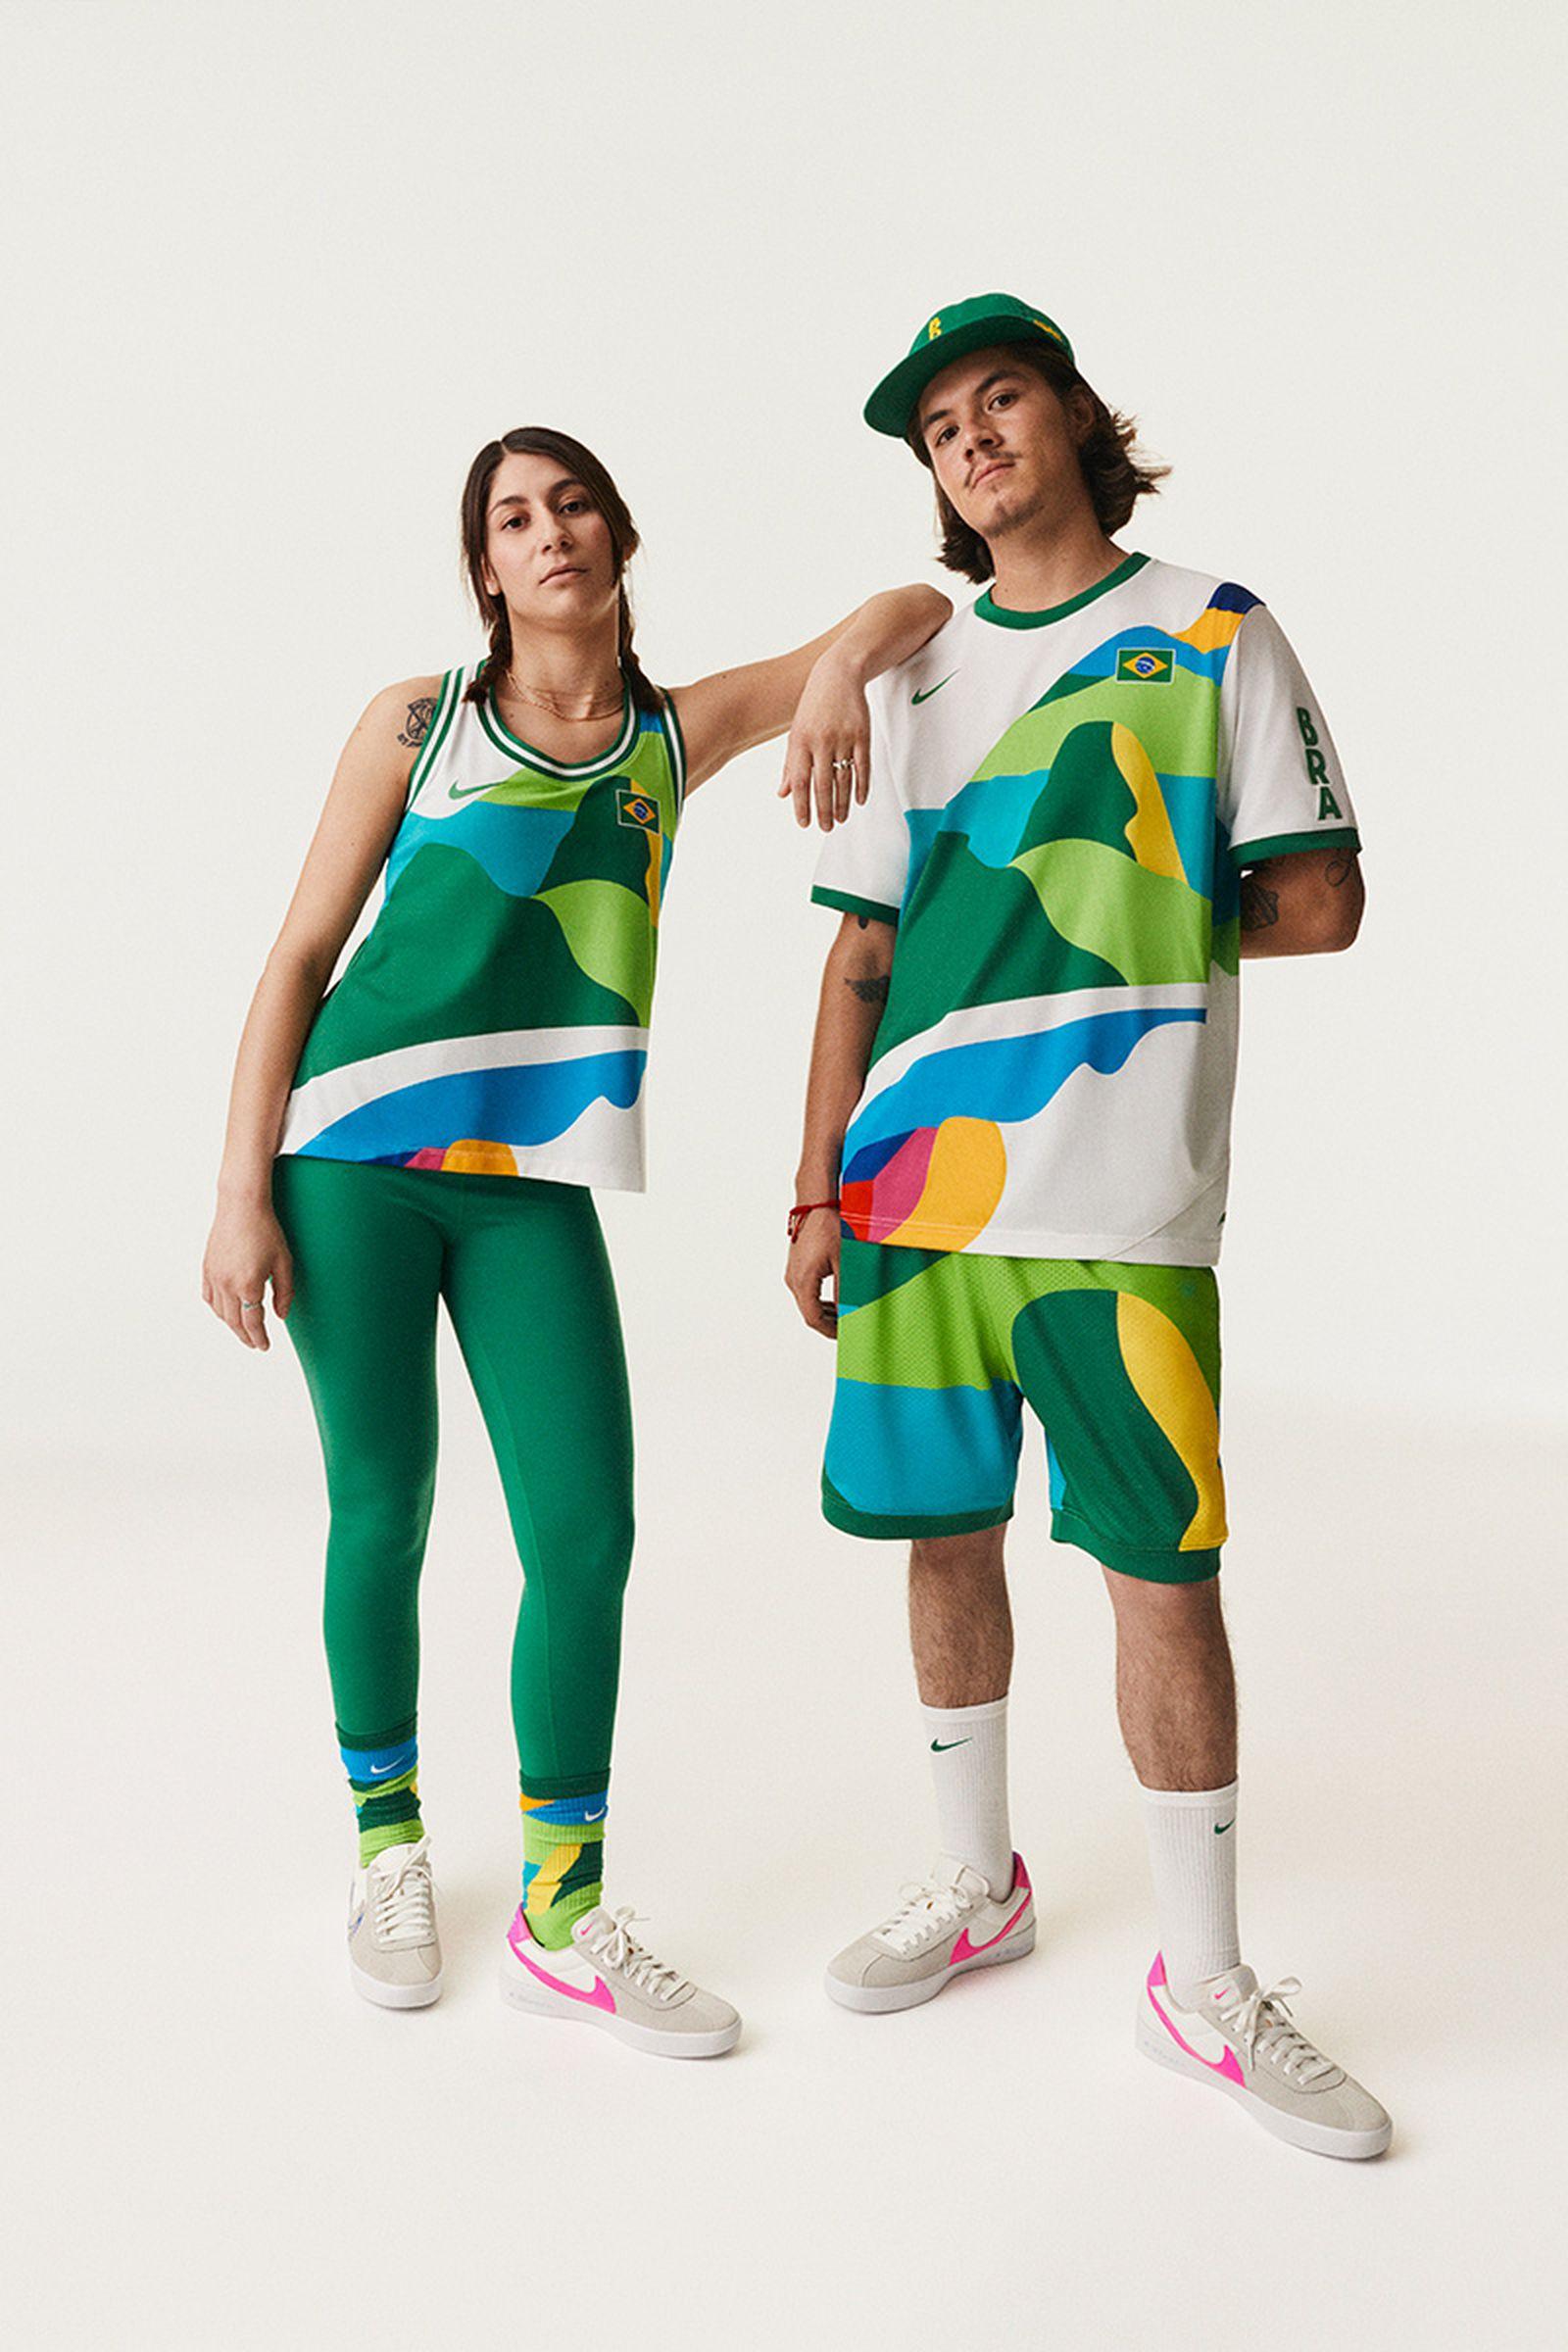 nike-sb-tokyo-olympics-skateboarding-uniforms-03